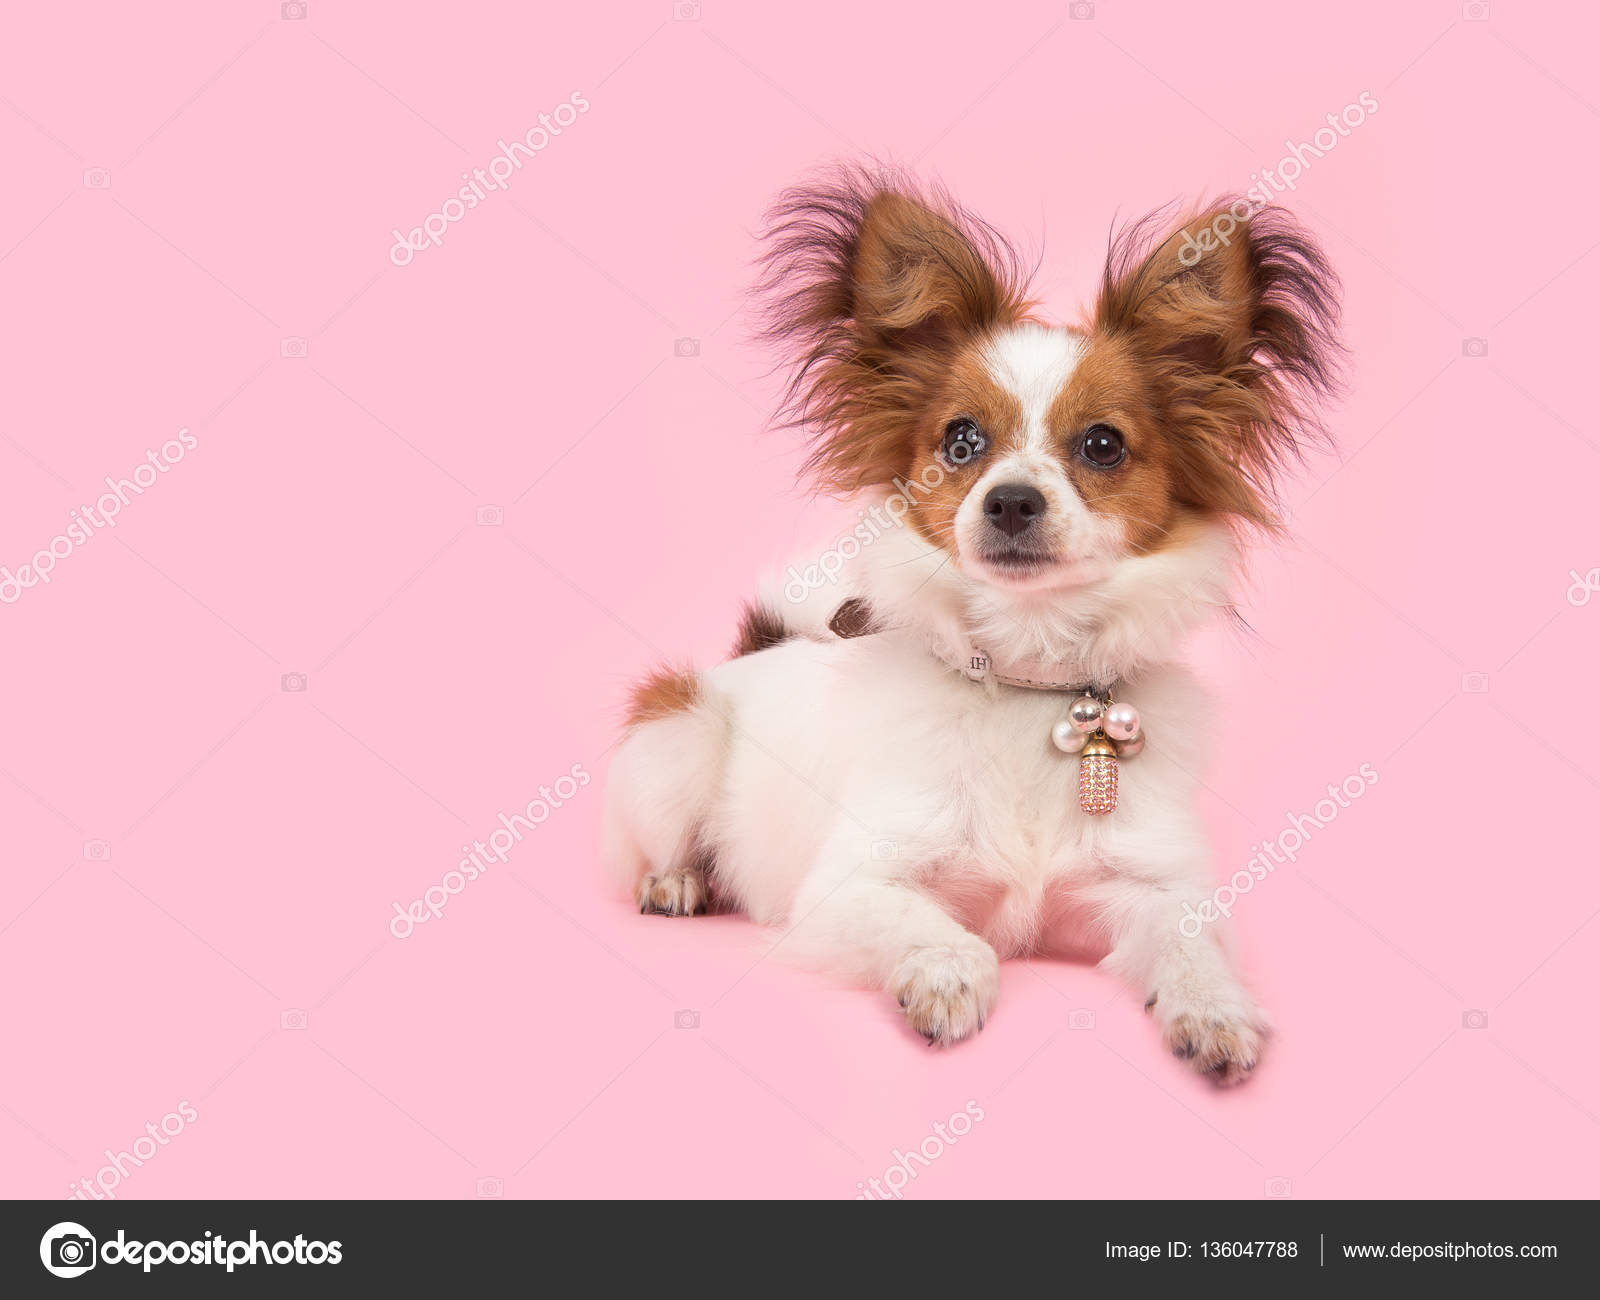 Great Papillon Canine Adorable Dog - depositphotos_136047788-stock-photo-lying-down-cute-papillon-dog  2018_797891  .jpg